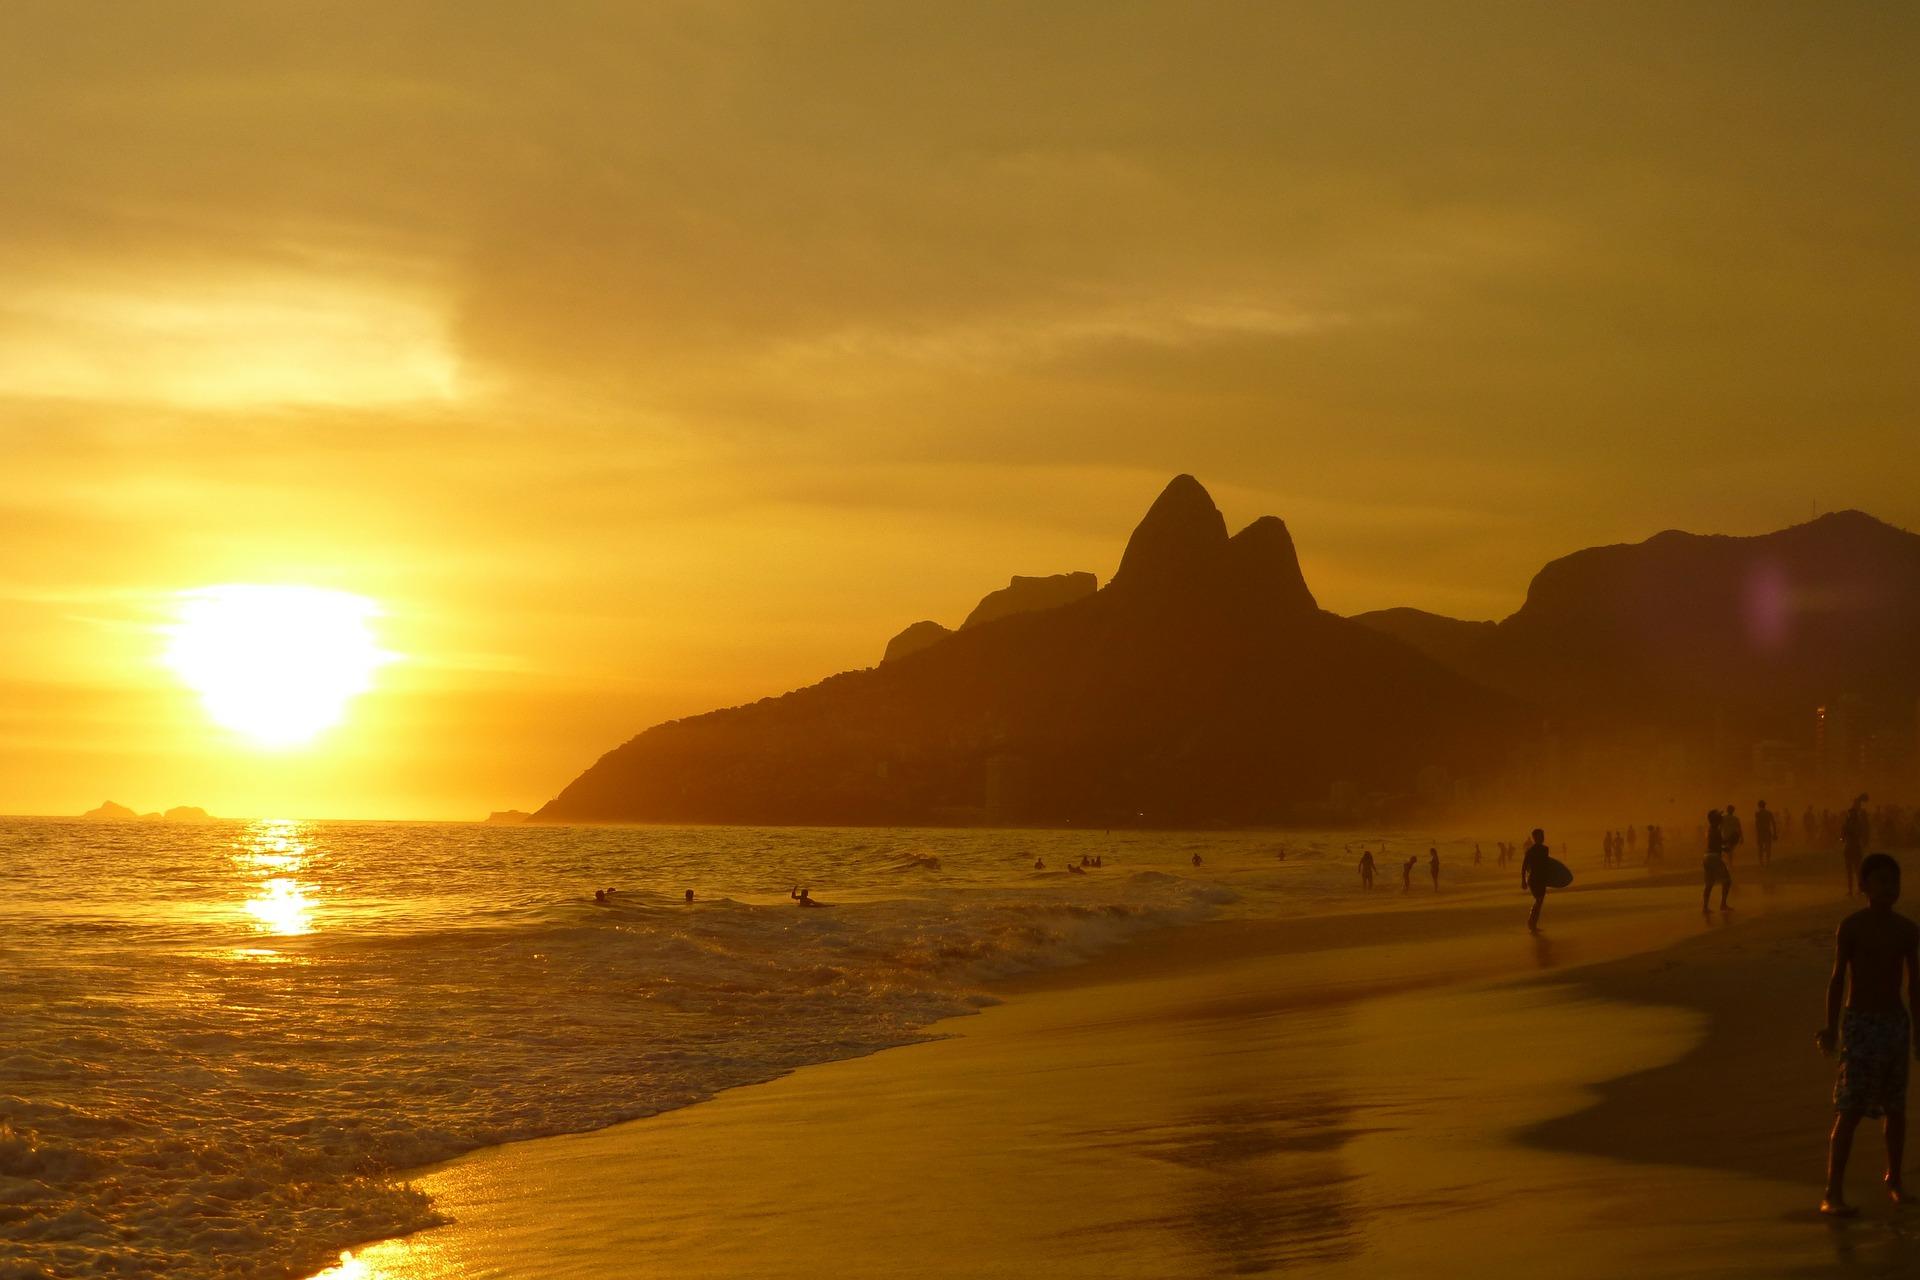 Ipanema, Ρίο ντε Τζανέιρο διακοπές, Παραλία, Ηλιοβασίλεμα, Κυρ, βουνά, Κίτρινο - Wallpapers HD - Professor-falken.com